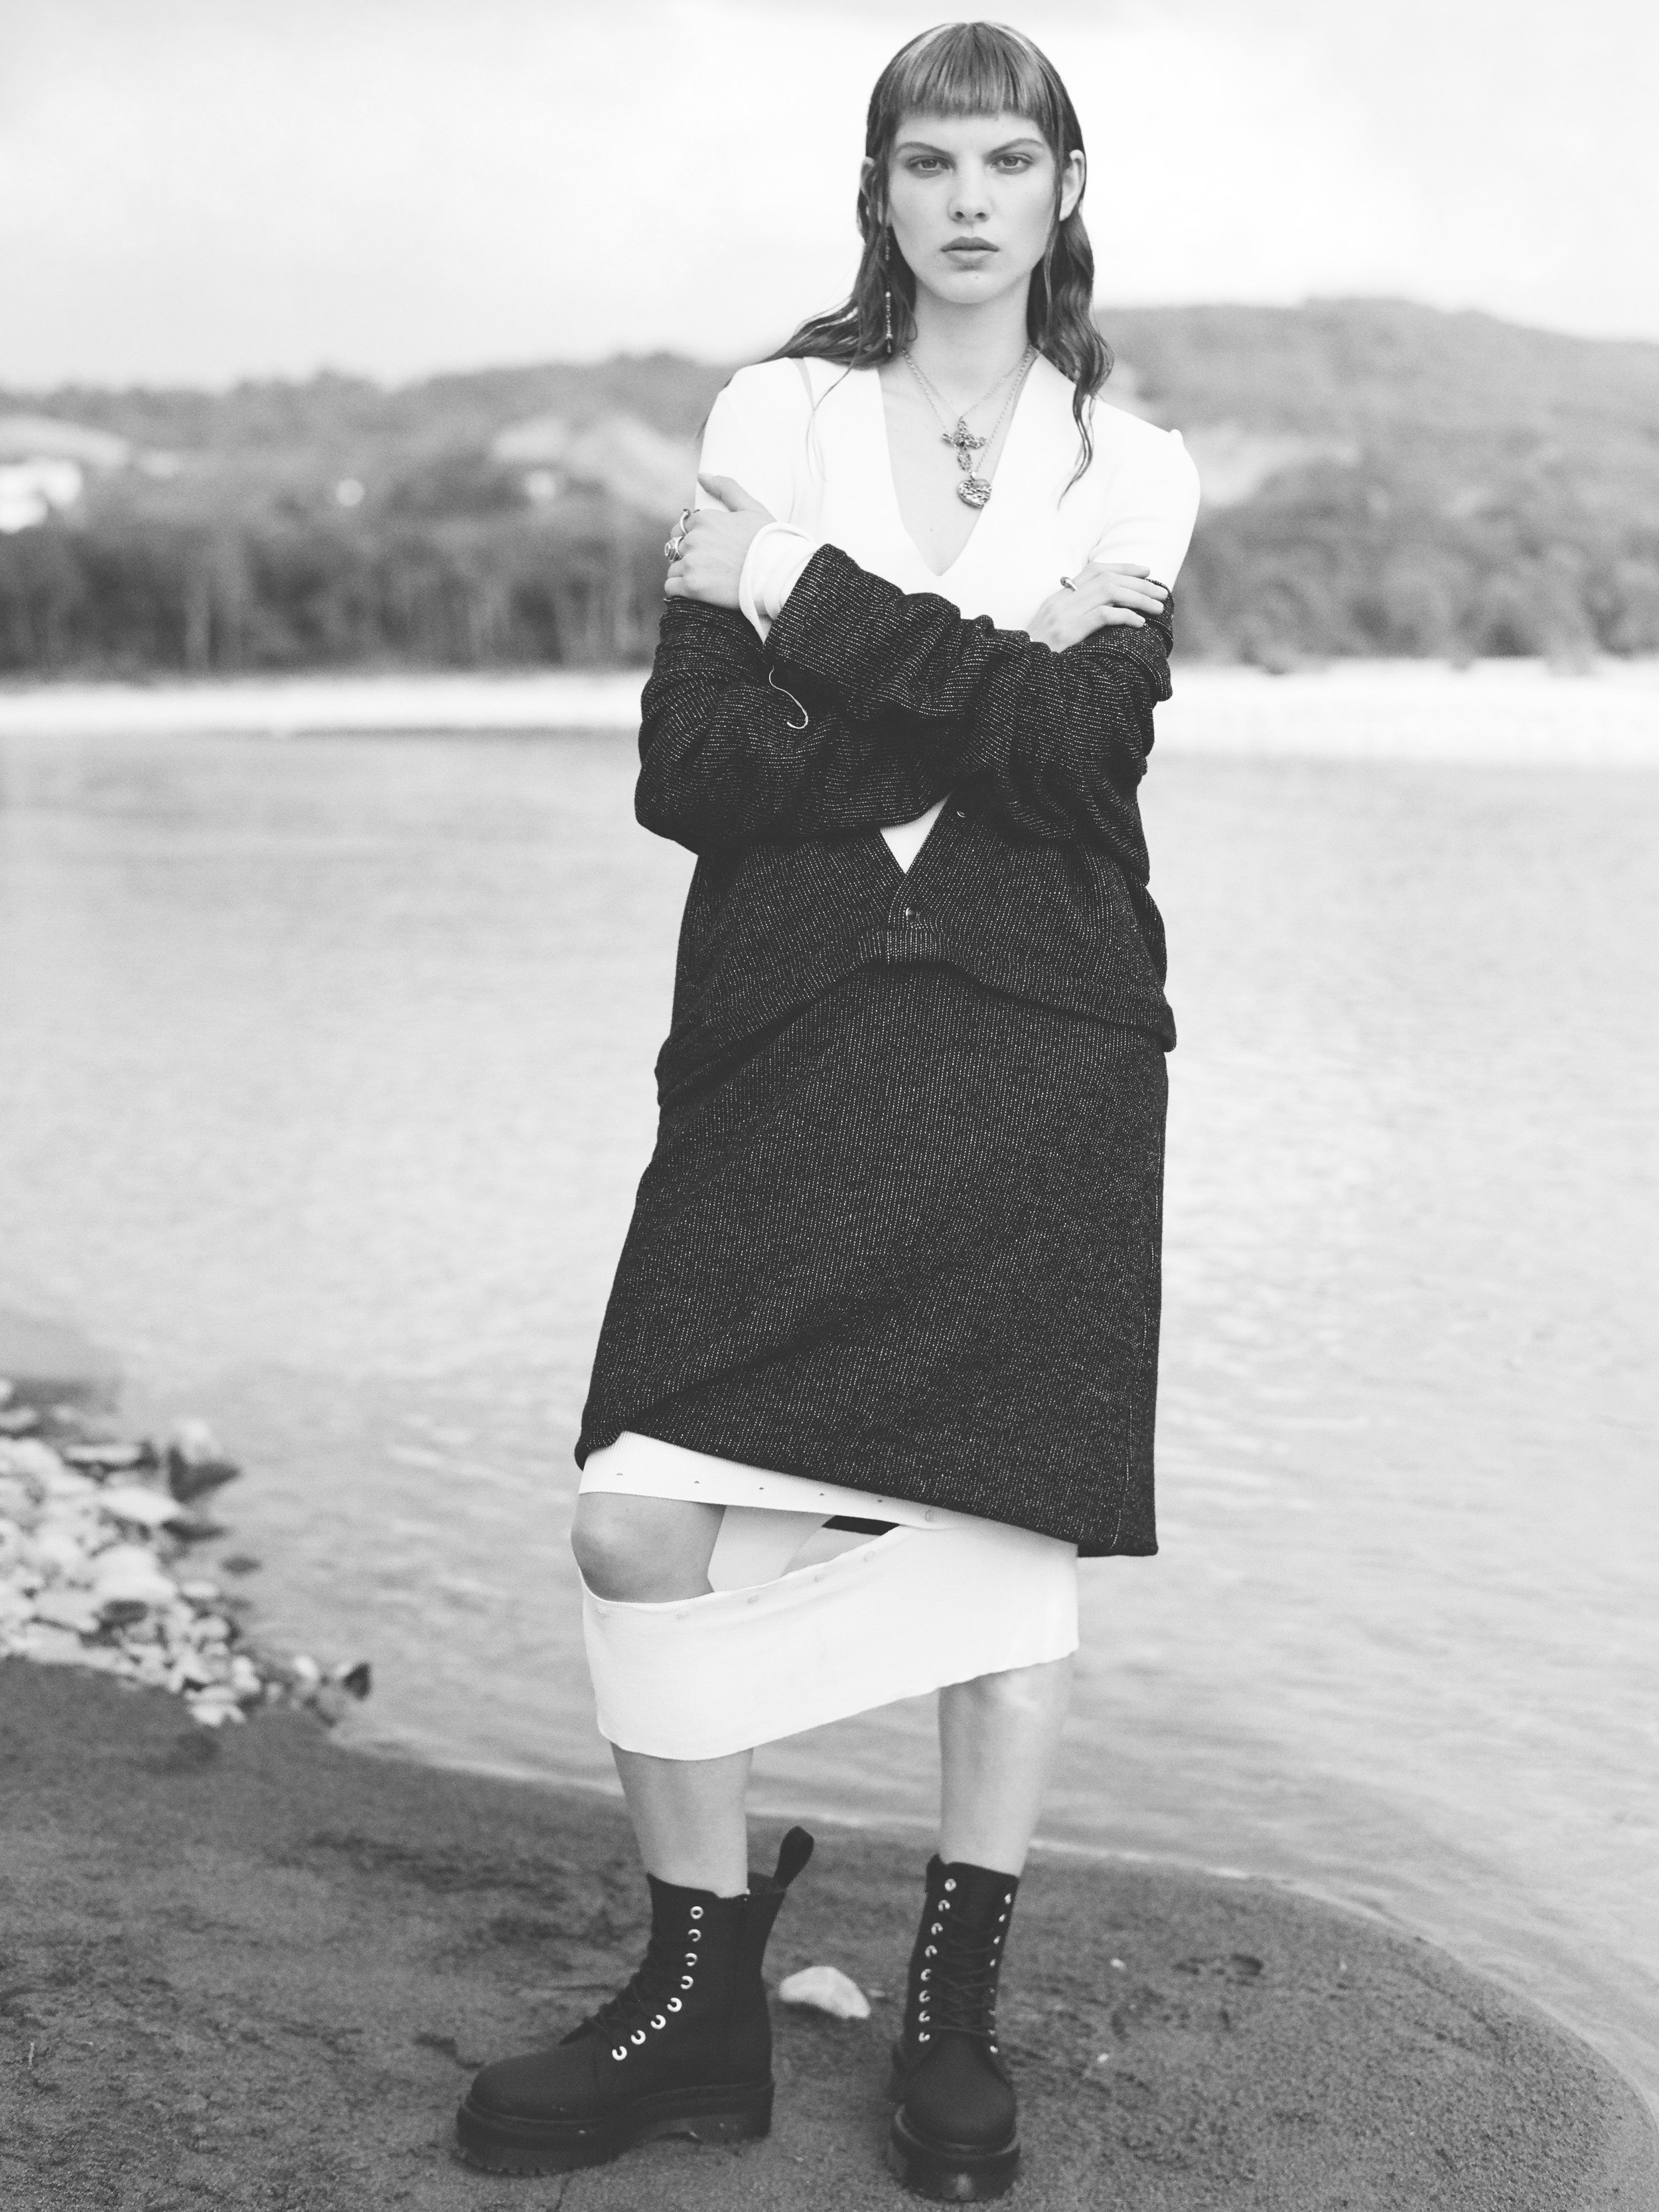 White Dress: Ports 1961; Black Dress: Studio Pretzel; Boots: Dr. Martens; Jewellery: Manuel Bozzi